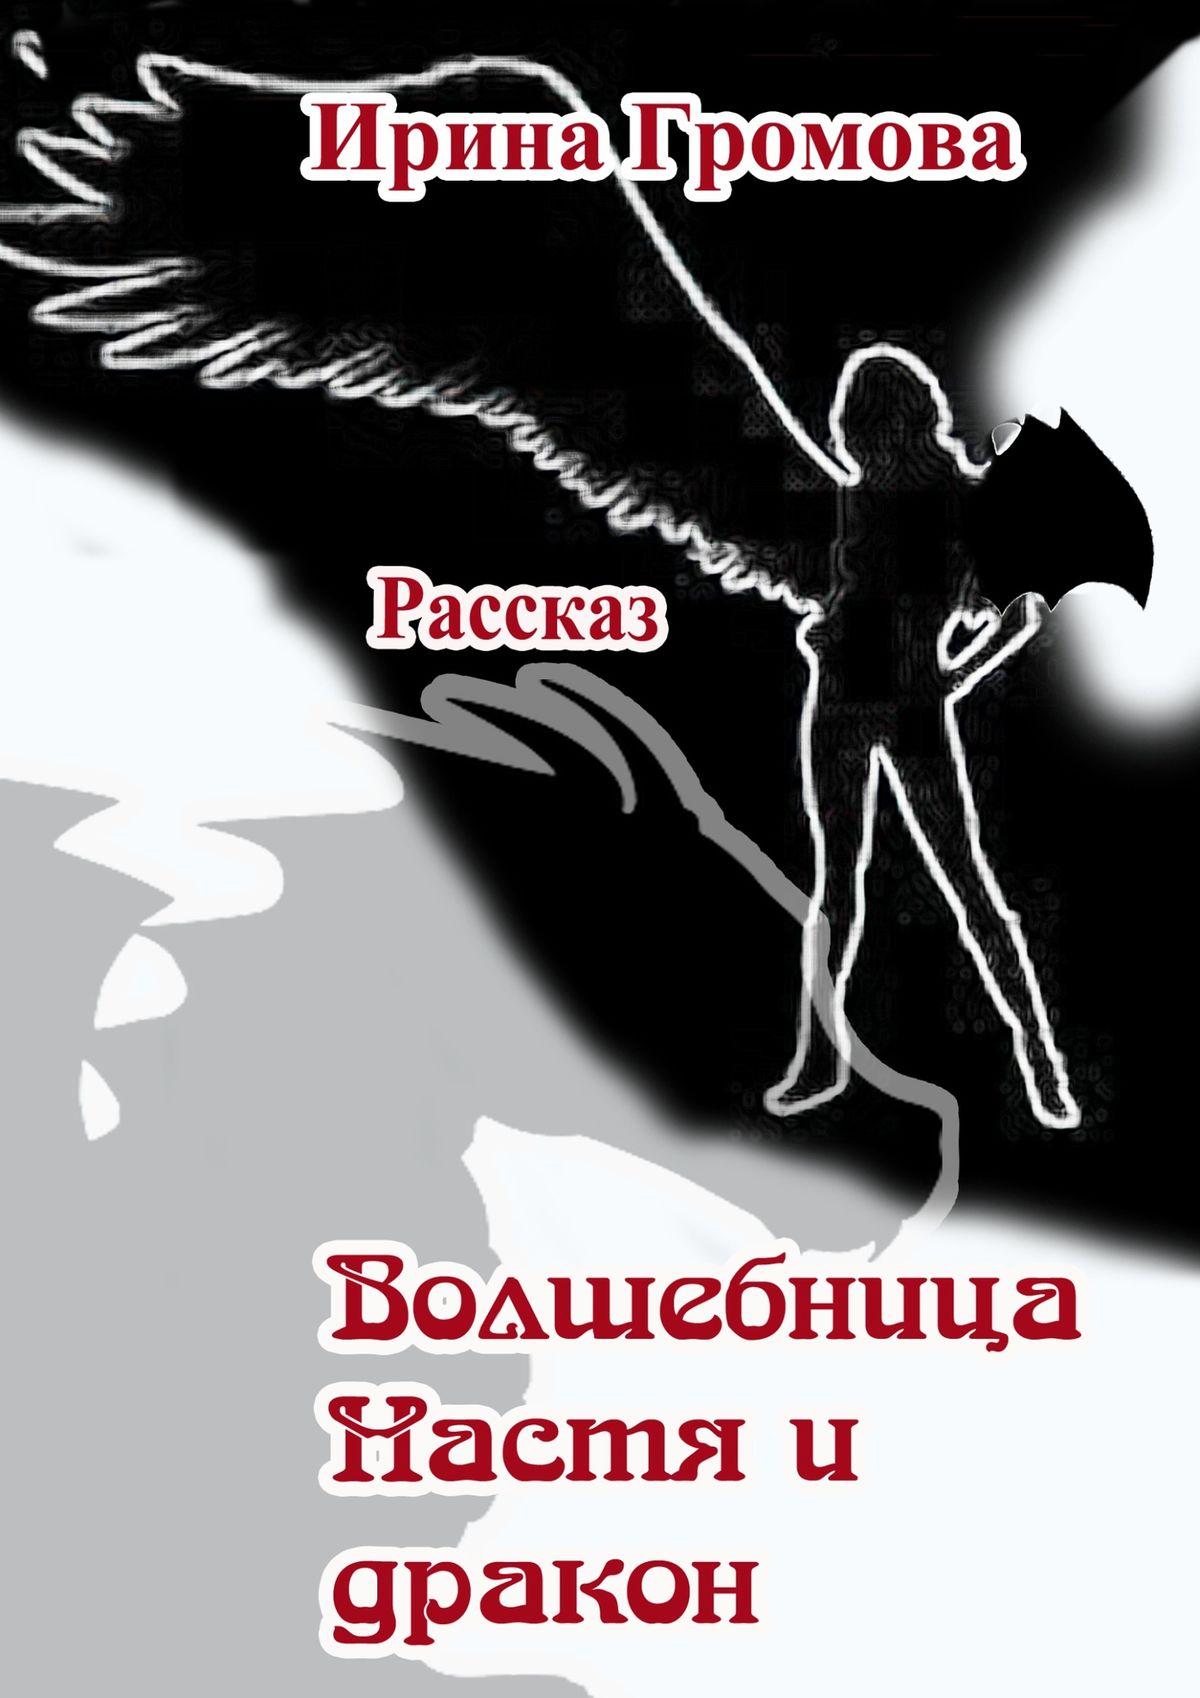 Ирина Громова Волшебница Настя и дракон анатолий курчаткин волшебница настя